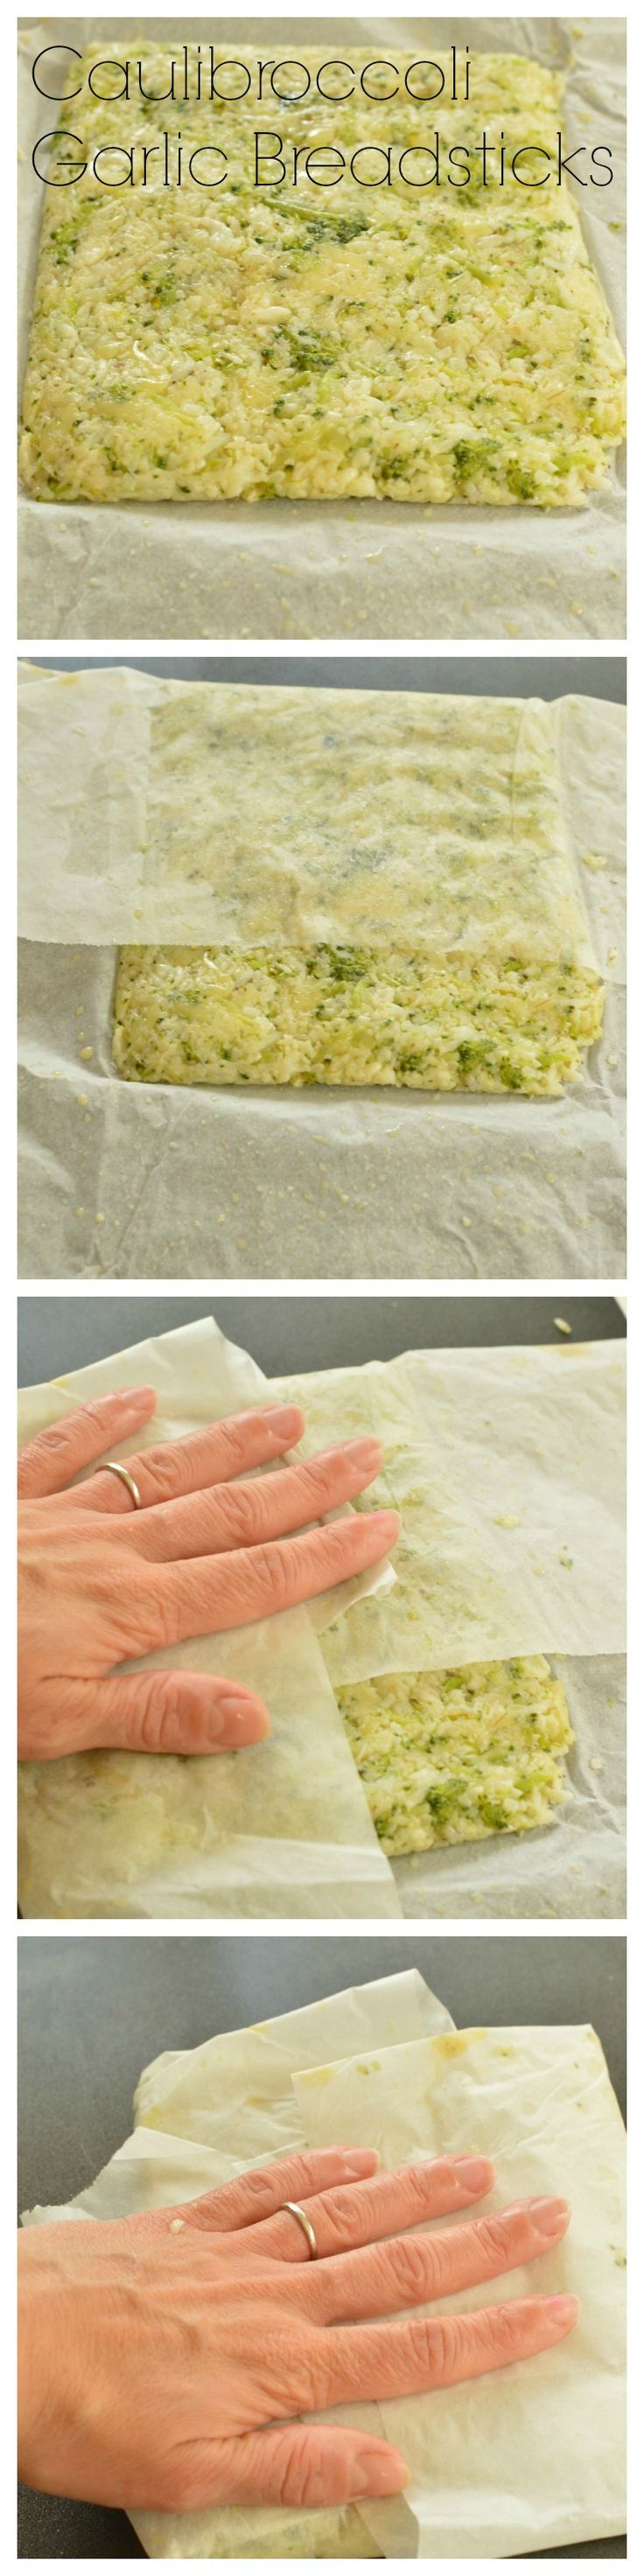 Cheesy CauliBroccoli Garlic Breadsticks #lowcarbbread #lowcarbdiet